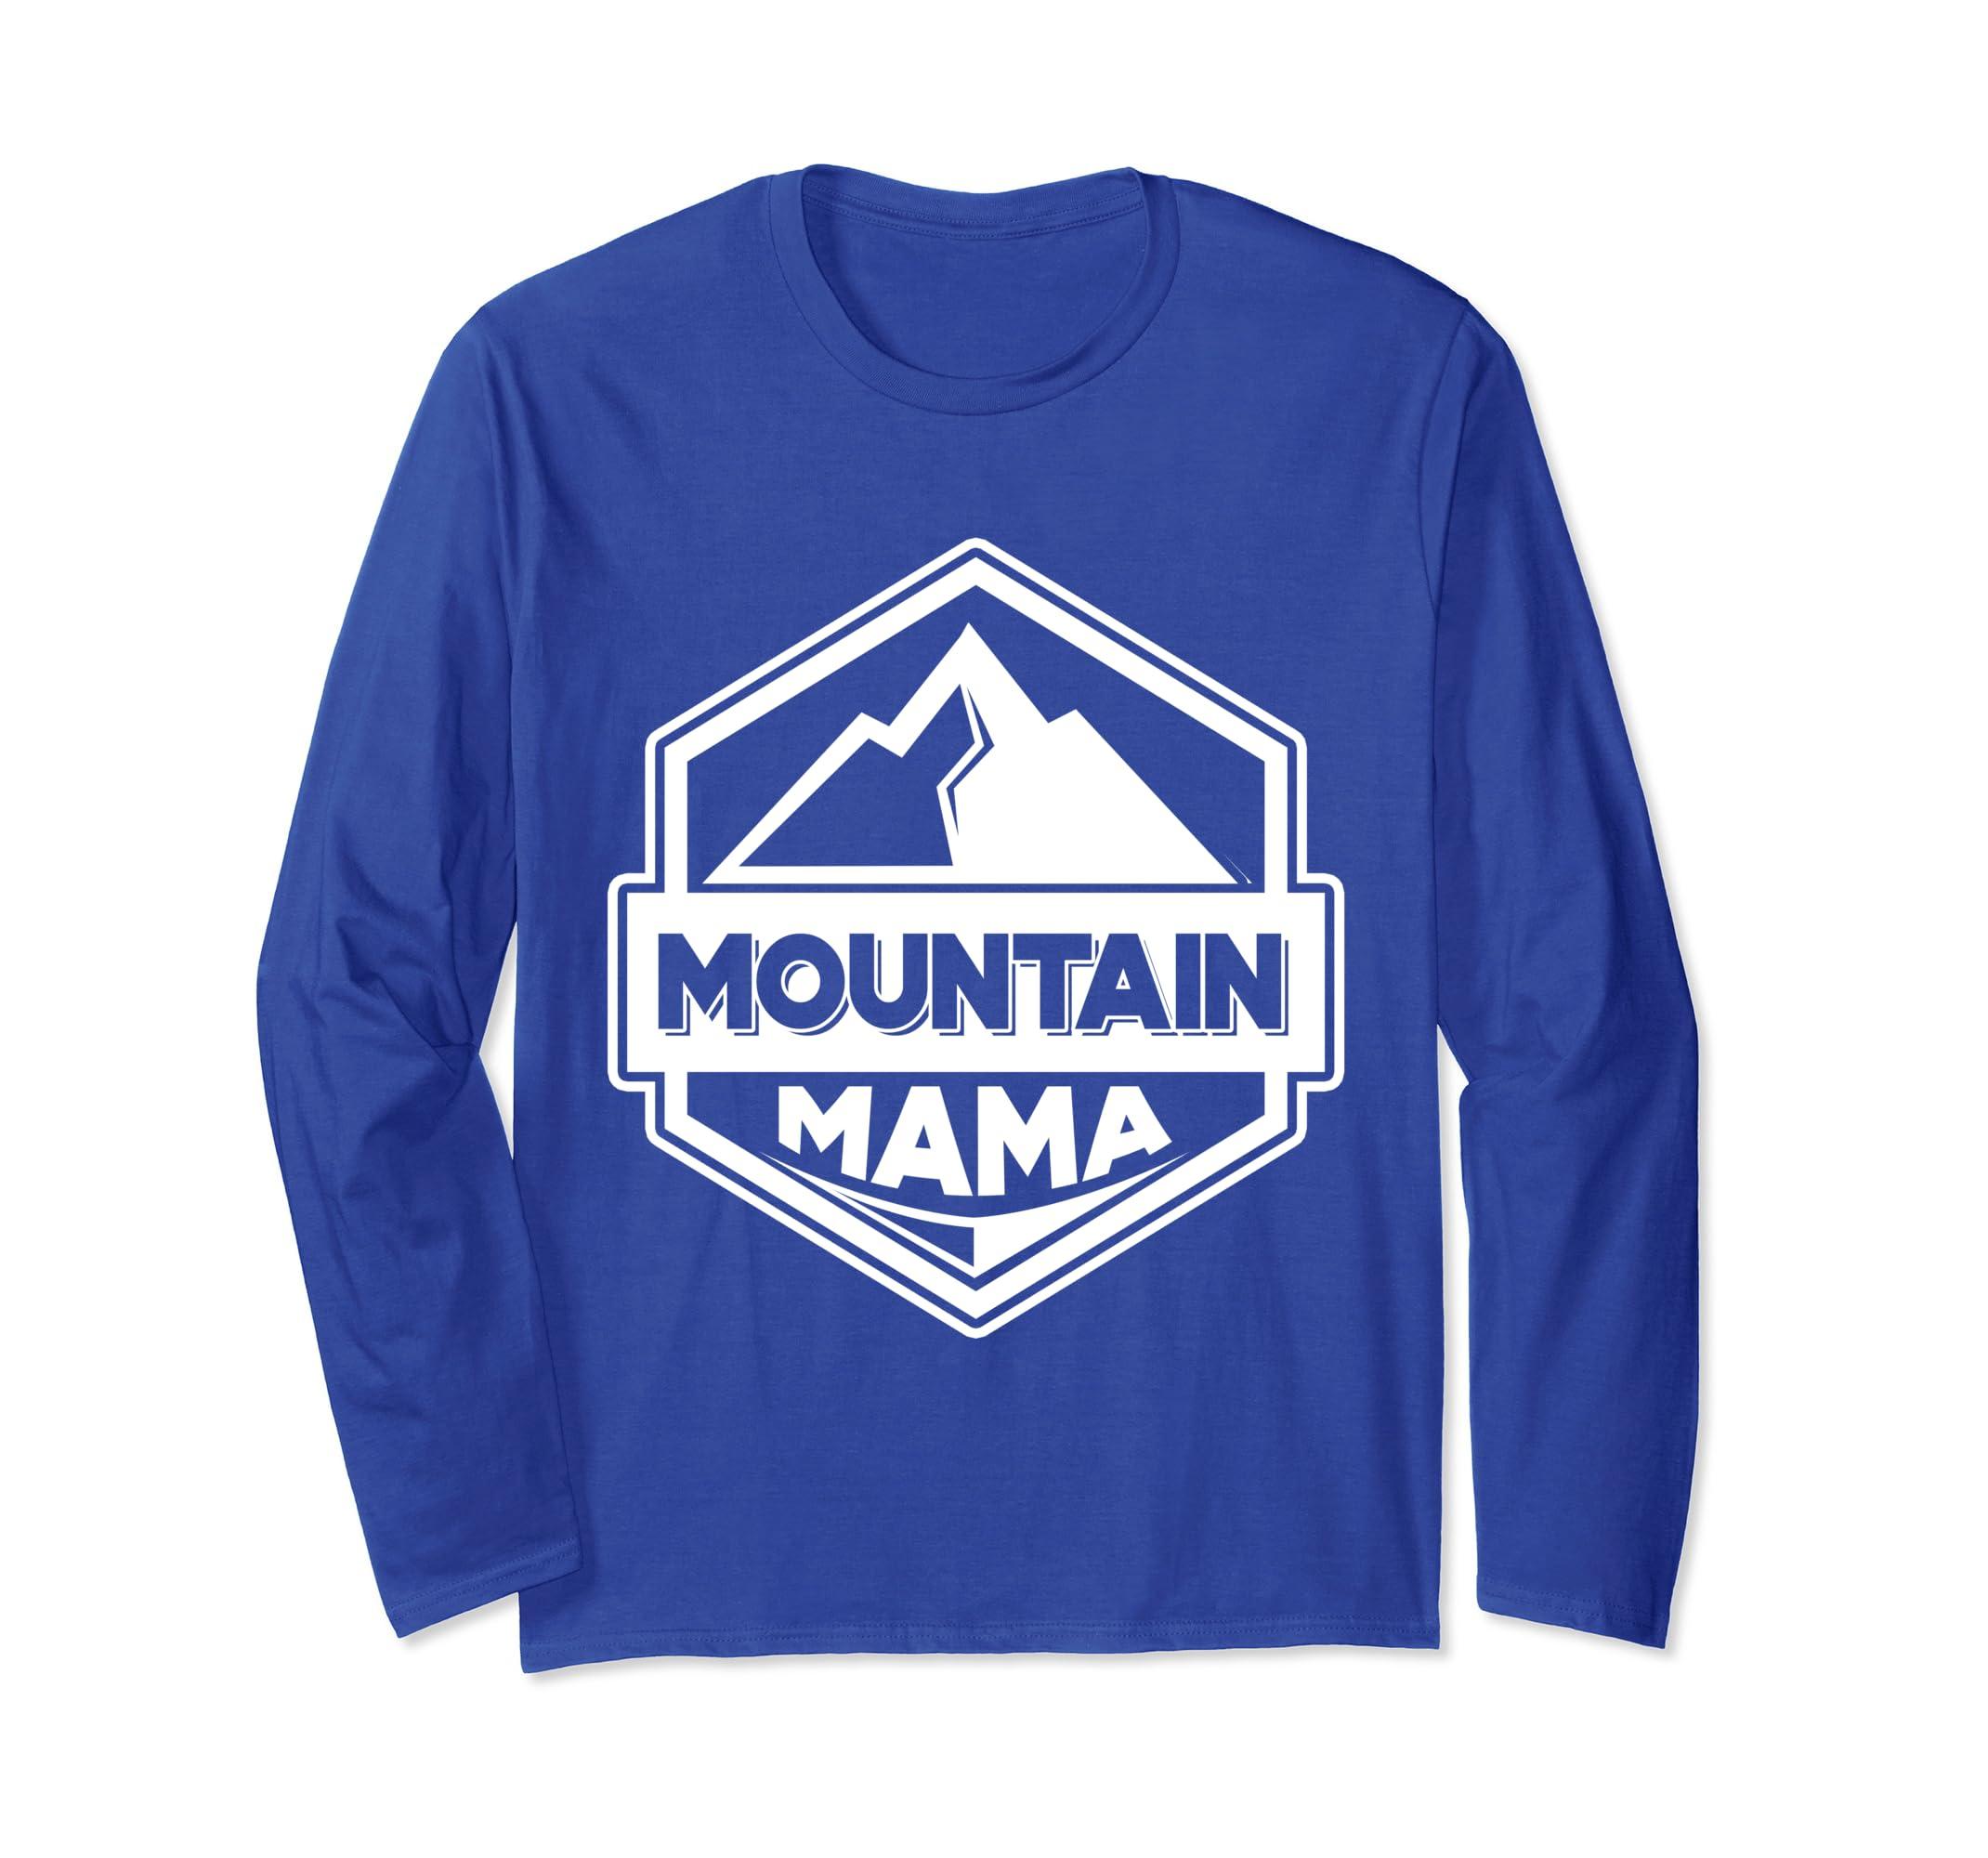 'Mountain Mama' Awesome Mountain Gift Shirt-azvn